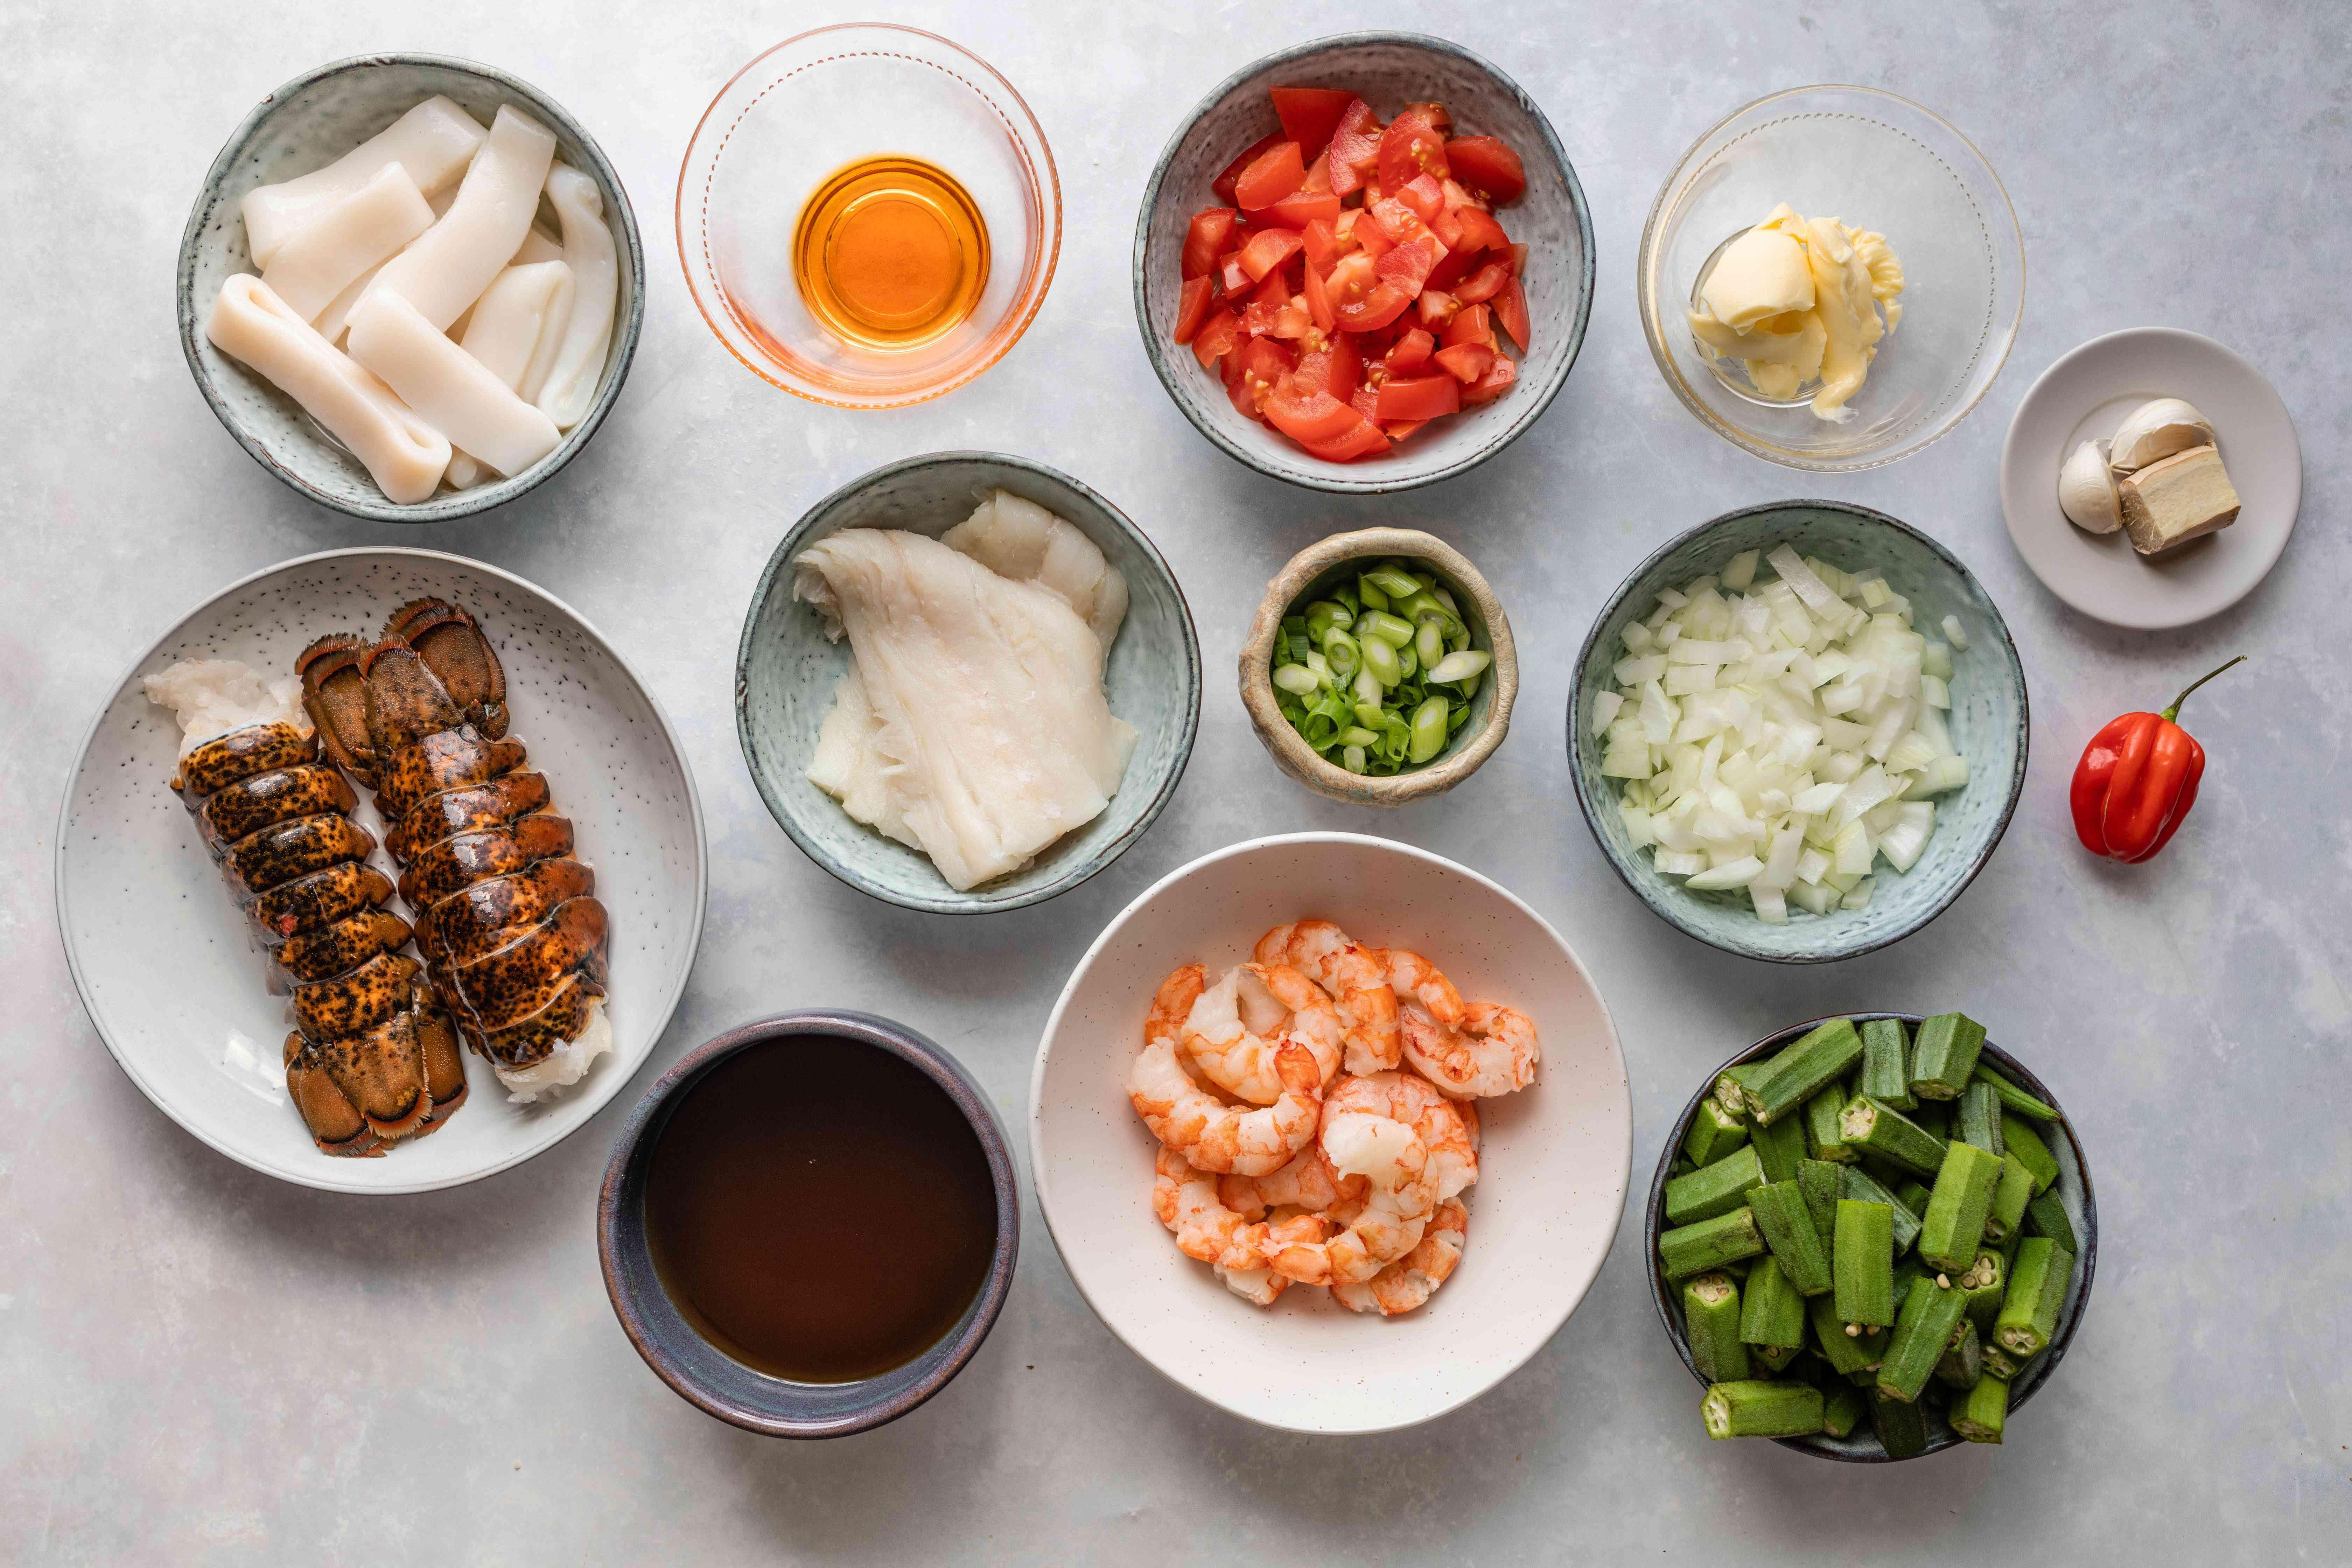 Ingredients for okra stew